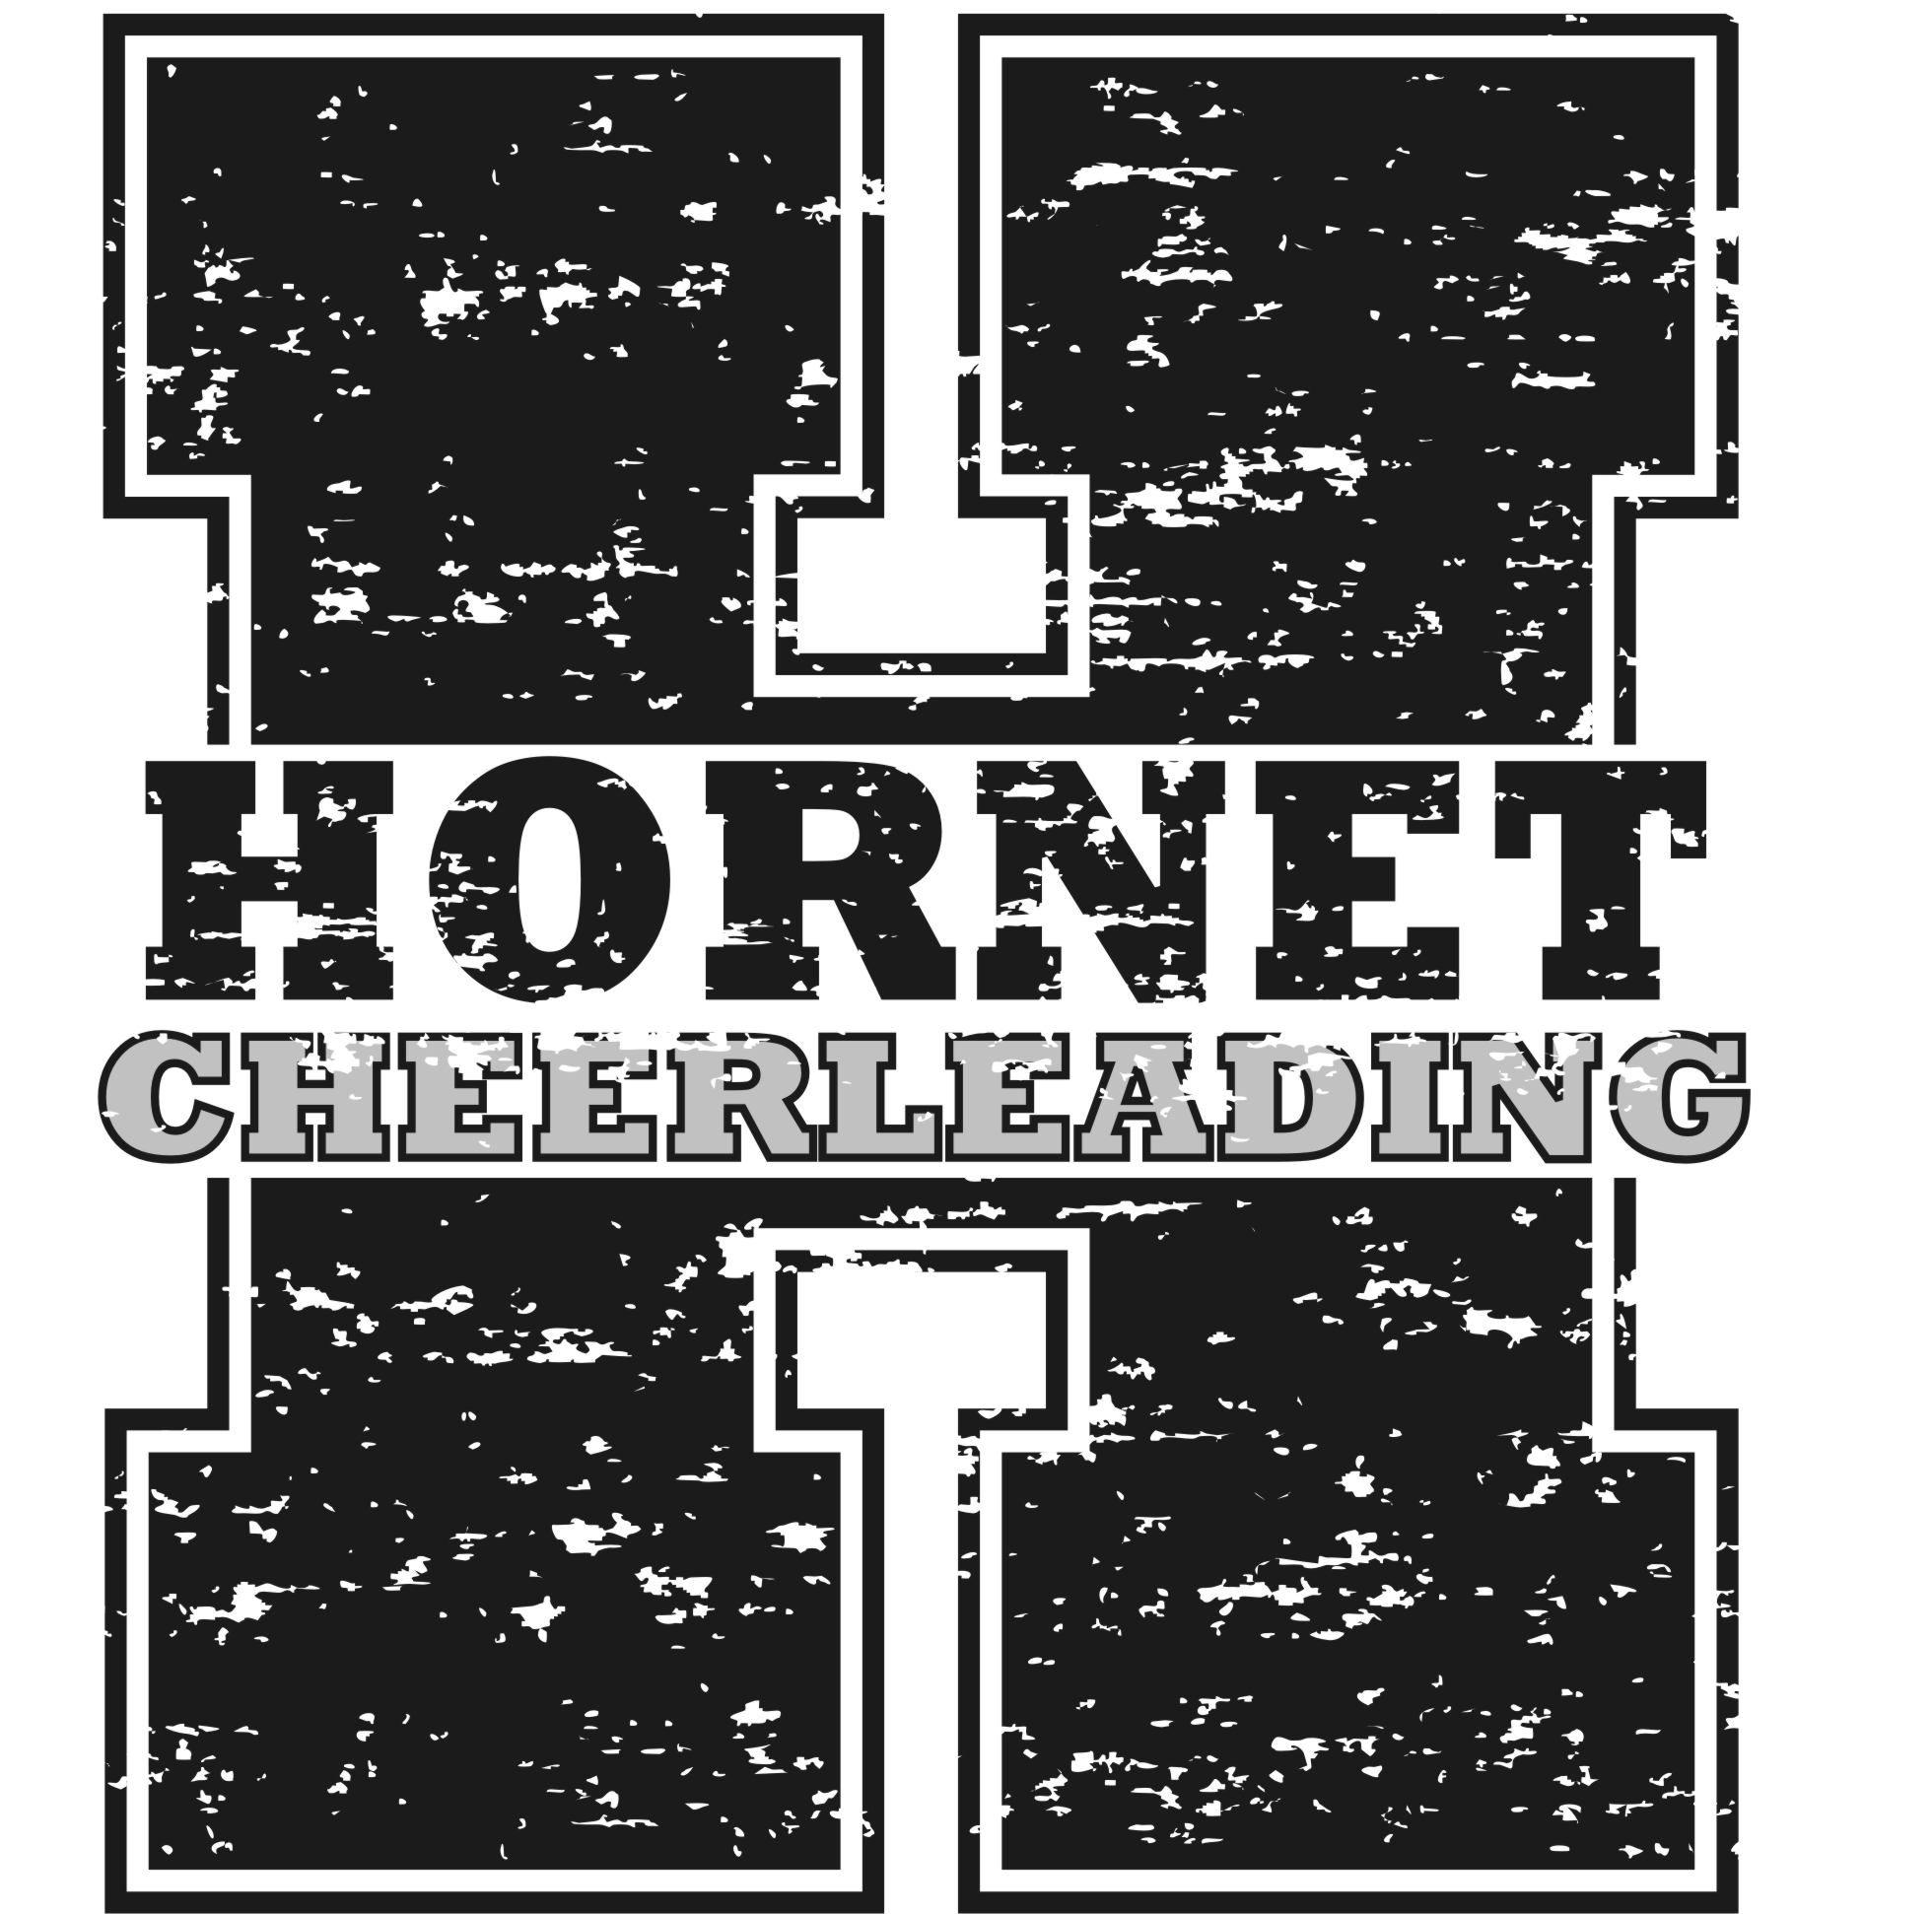 cheerleading t shirts churches school spirit sports family - Cheer Shirt Design Ideas